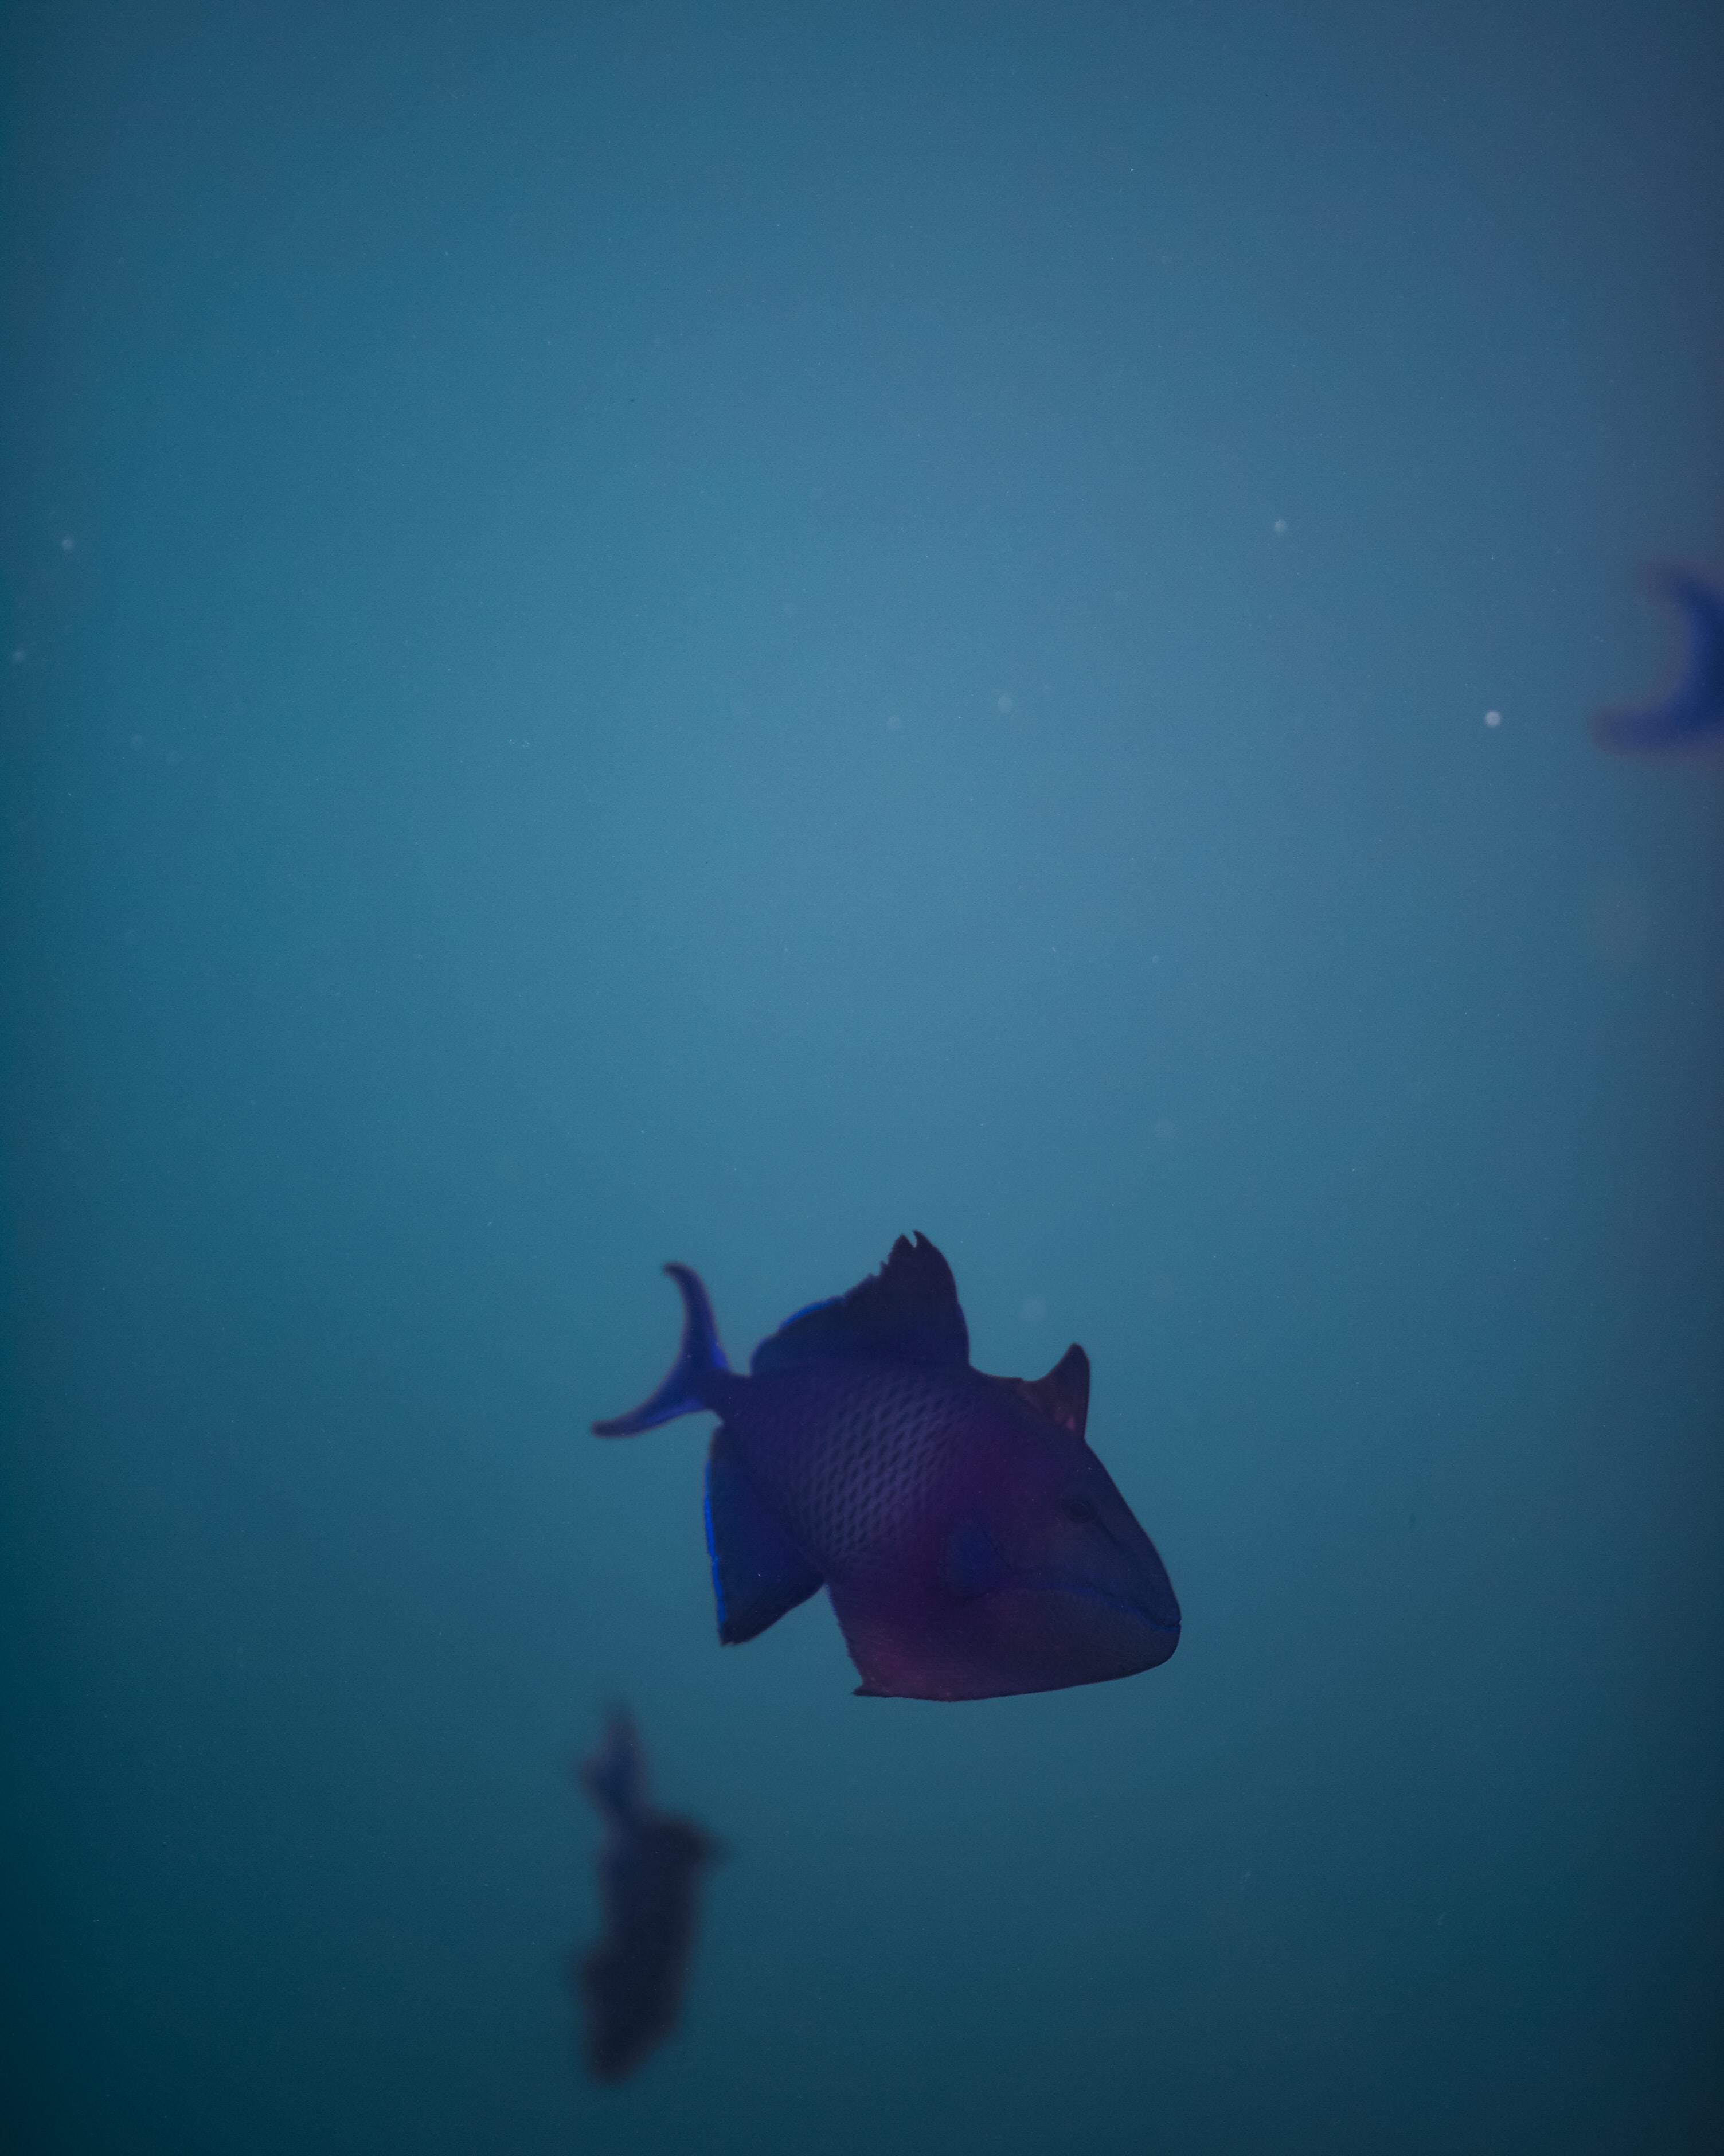 gray fish under water